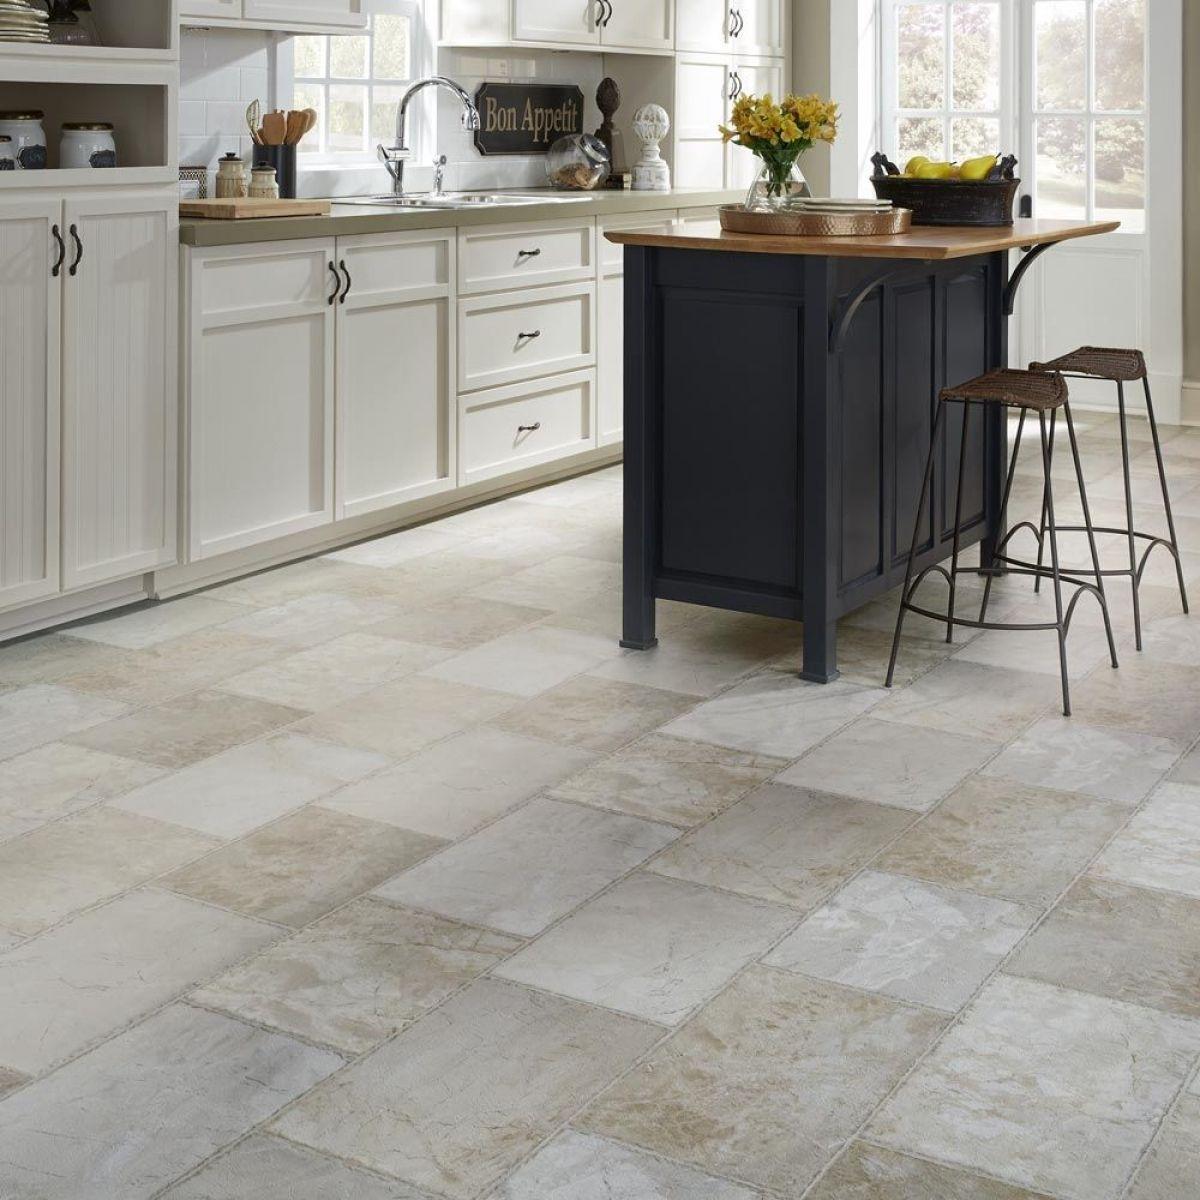 Resilient Natural Stone Vinyl Floor Upscale Rectangular Large Scale Inside Beautiful Vinyl Kitchen Floori Vinyl Flooring Kitchen Kitchen Vinyl Kitchen Flooring